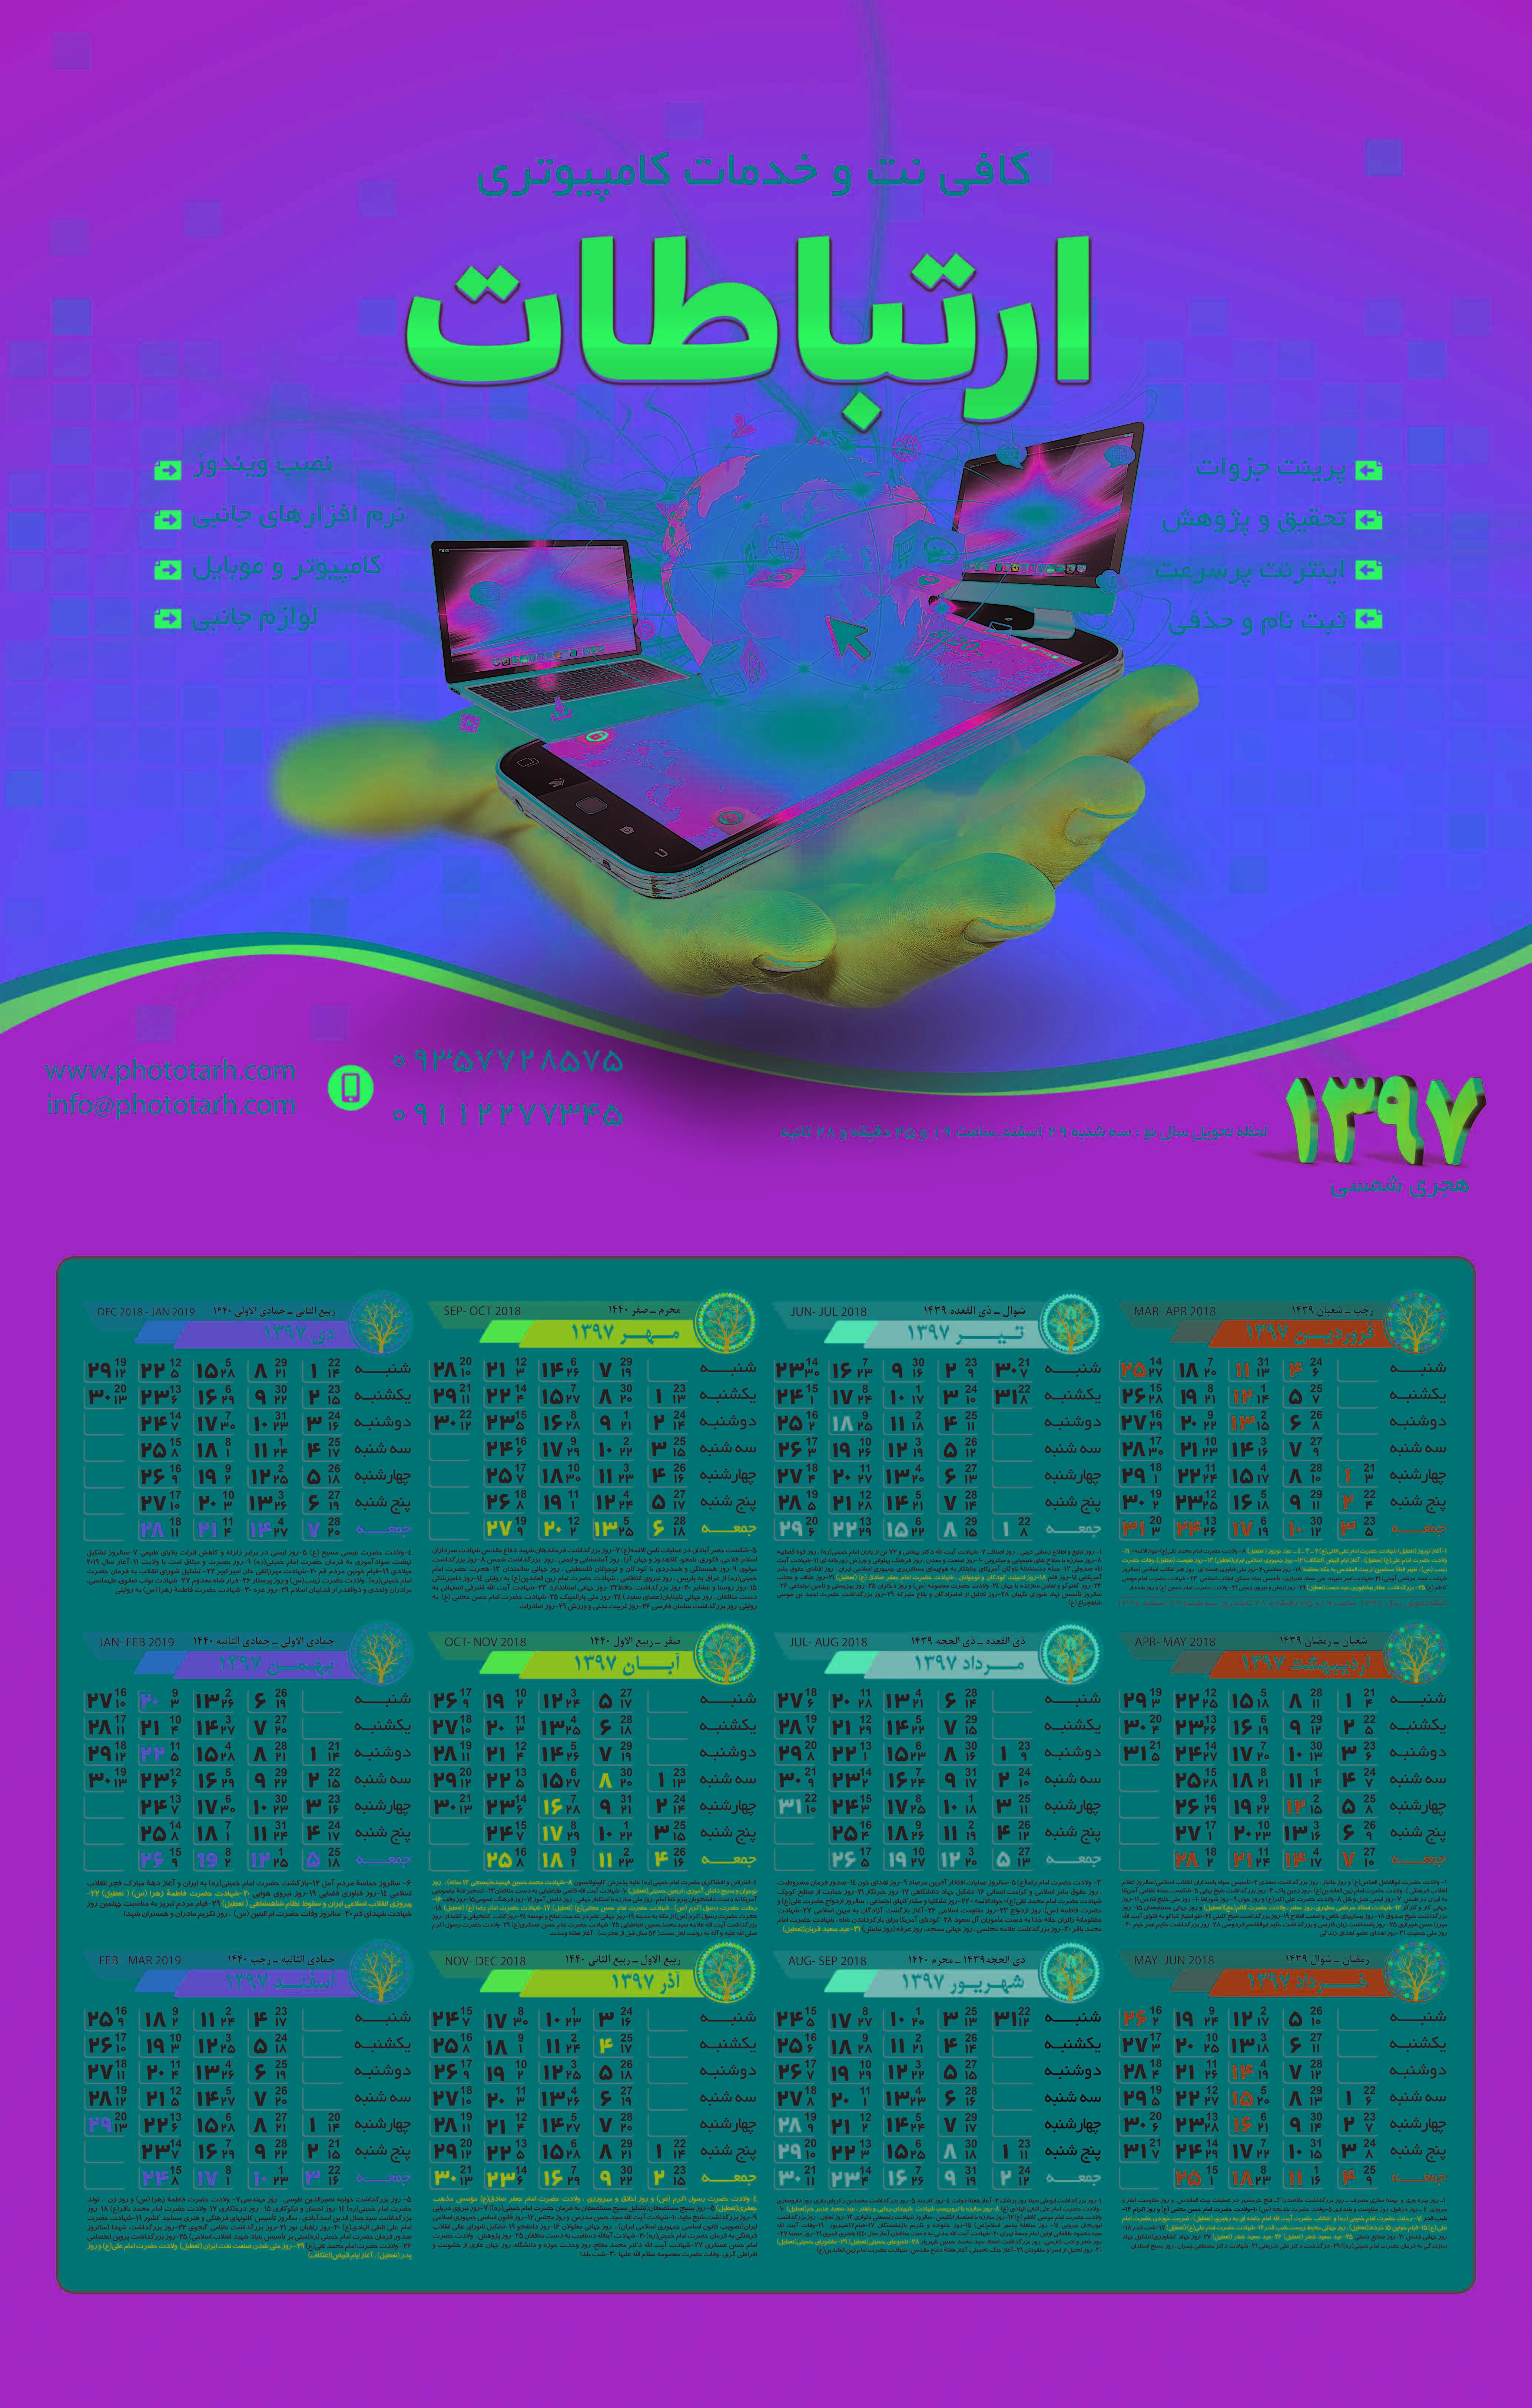 taghvim4 960915 Phototarh.com poster - تقویم 97 شرکت کامپیوتر